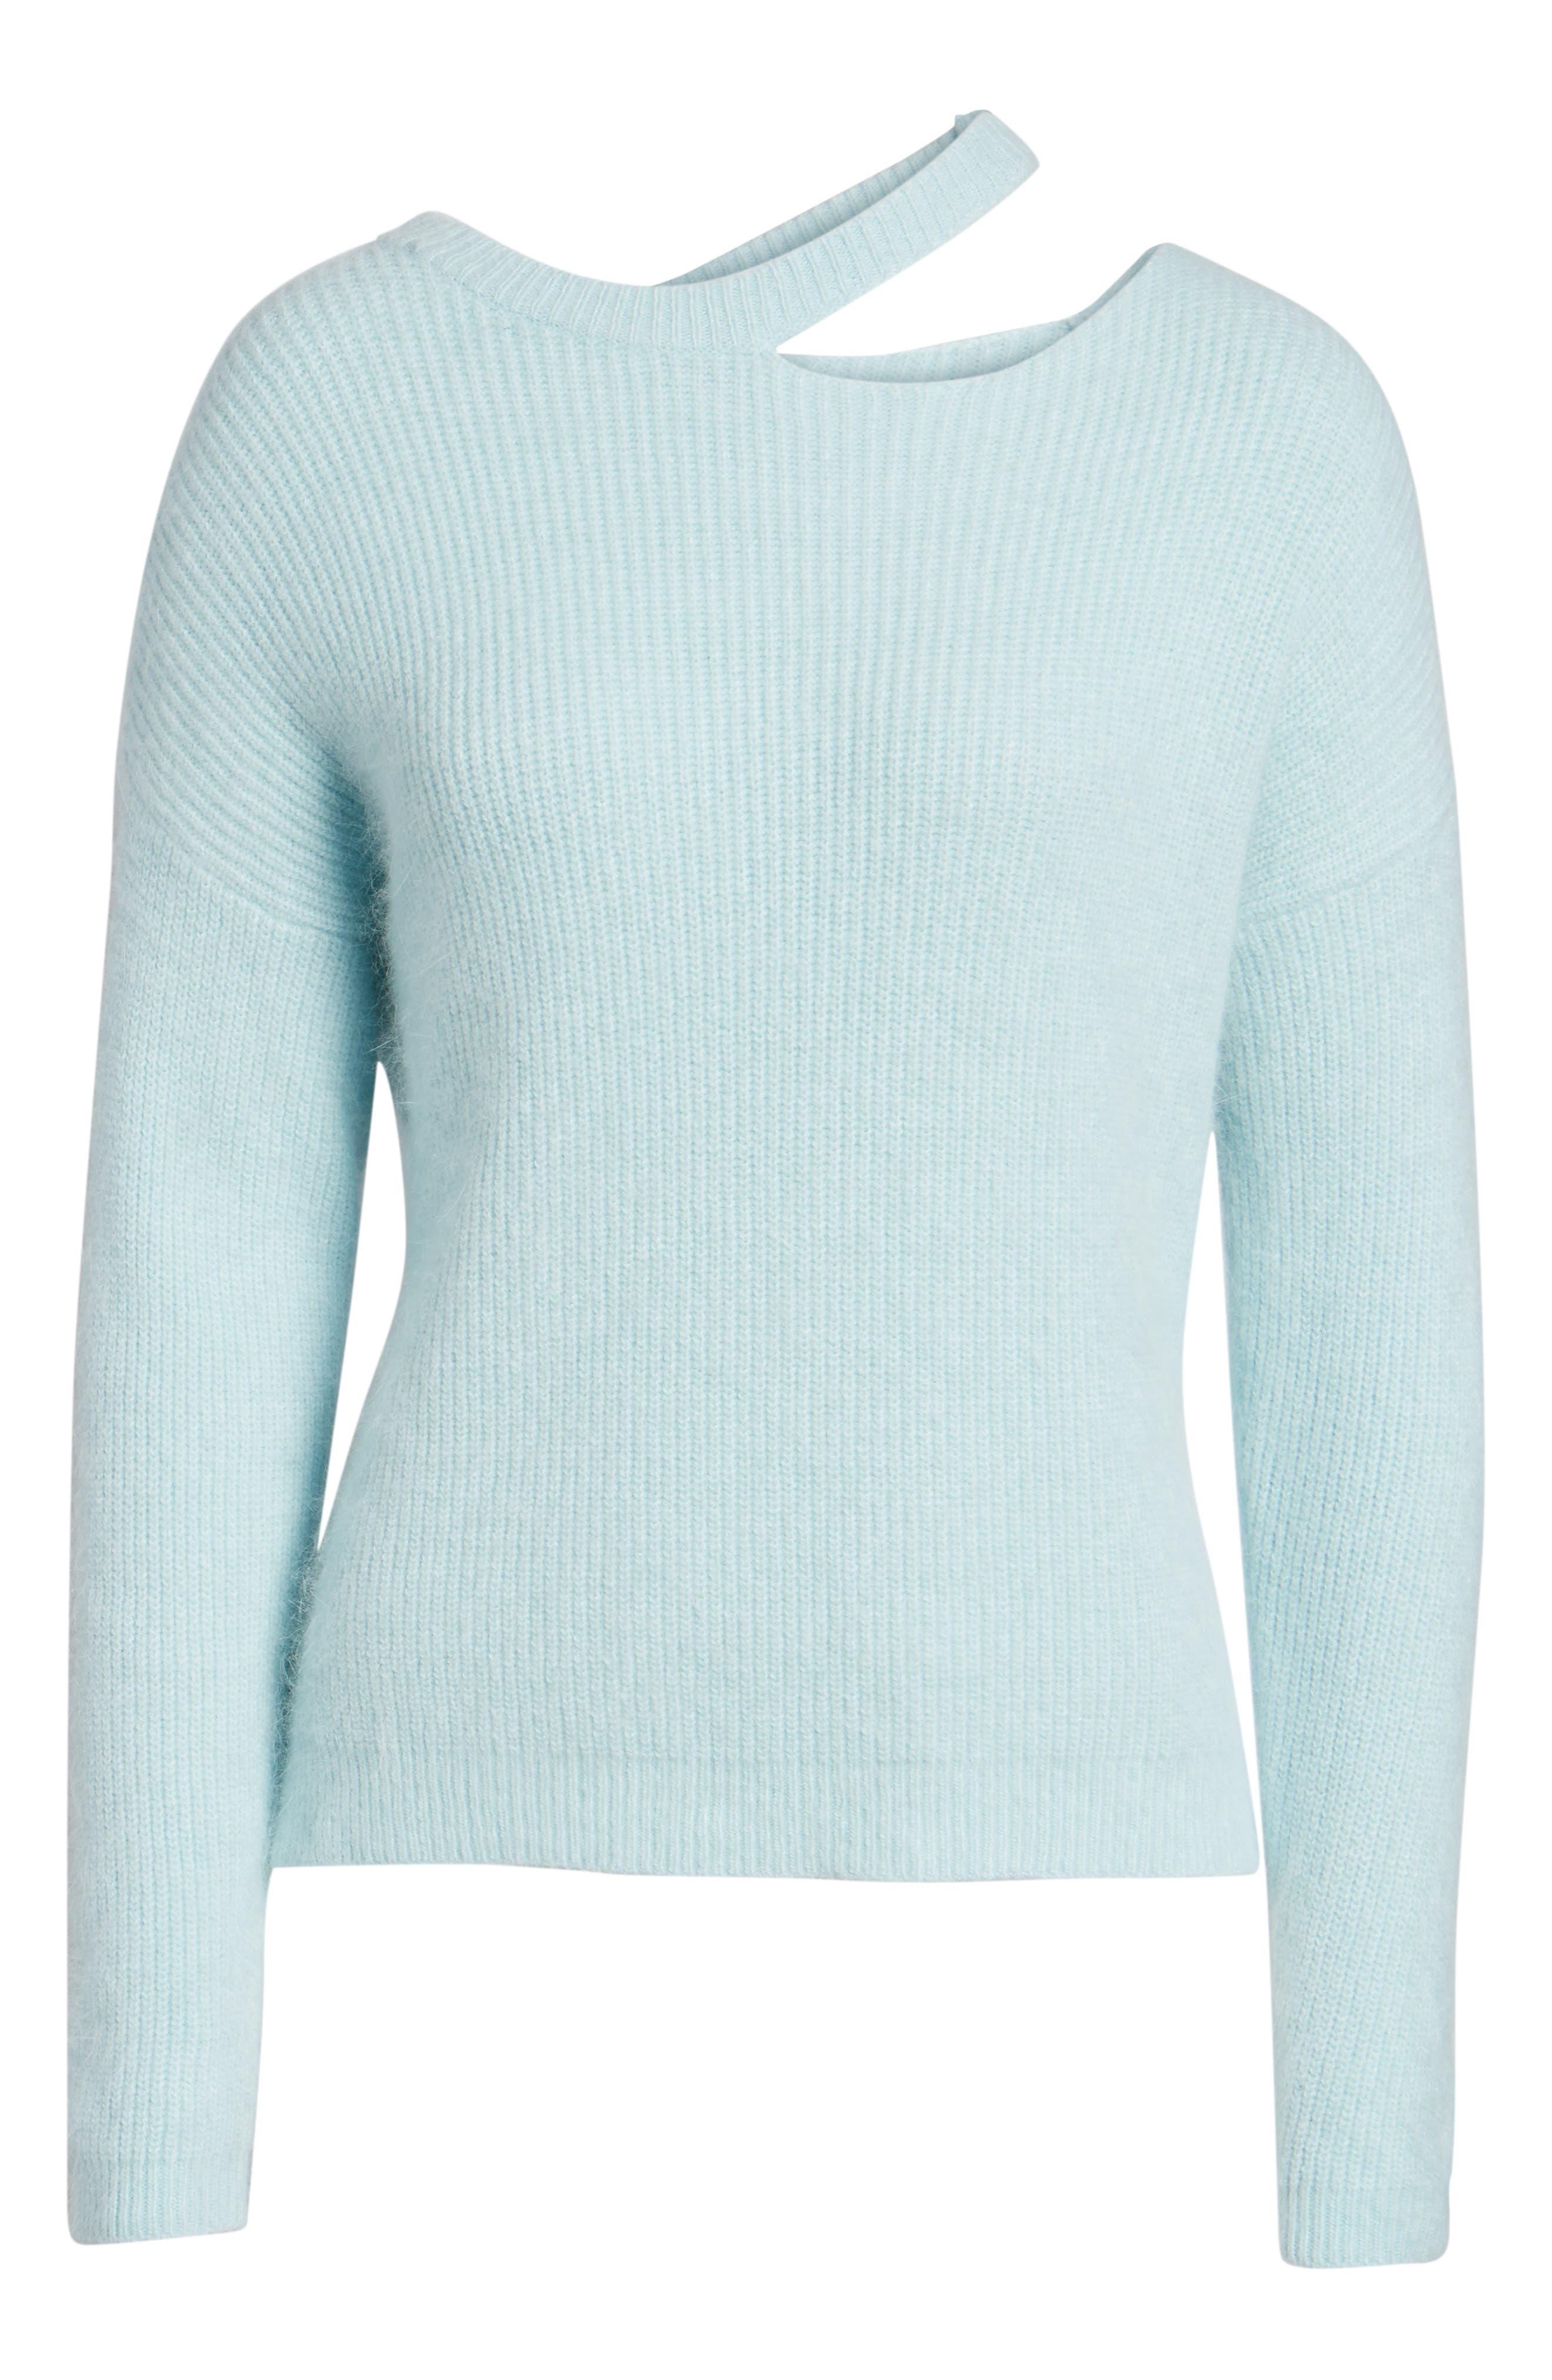 Ovidian Sweater,                             Alternate thumbnail 6, color,                             460